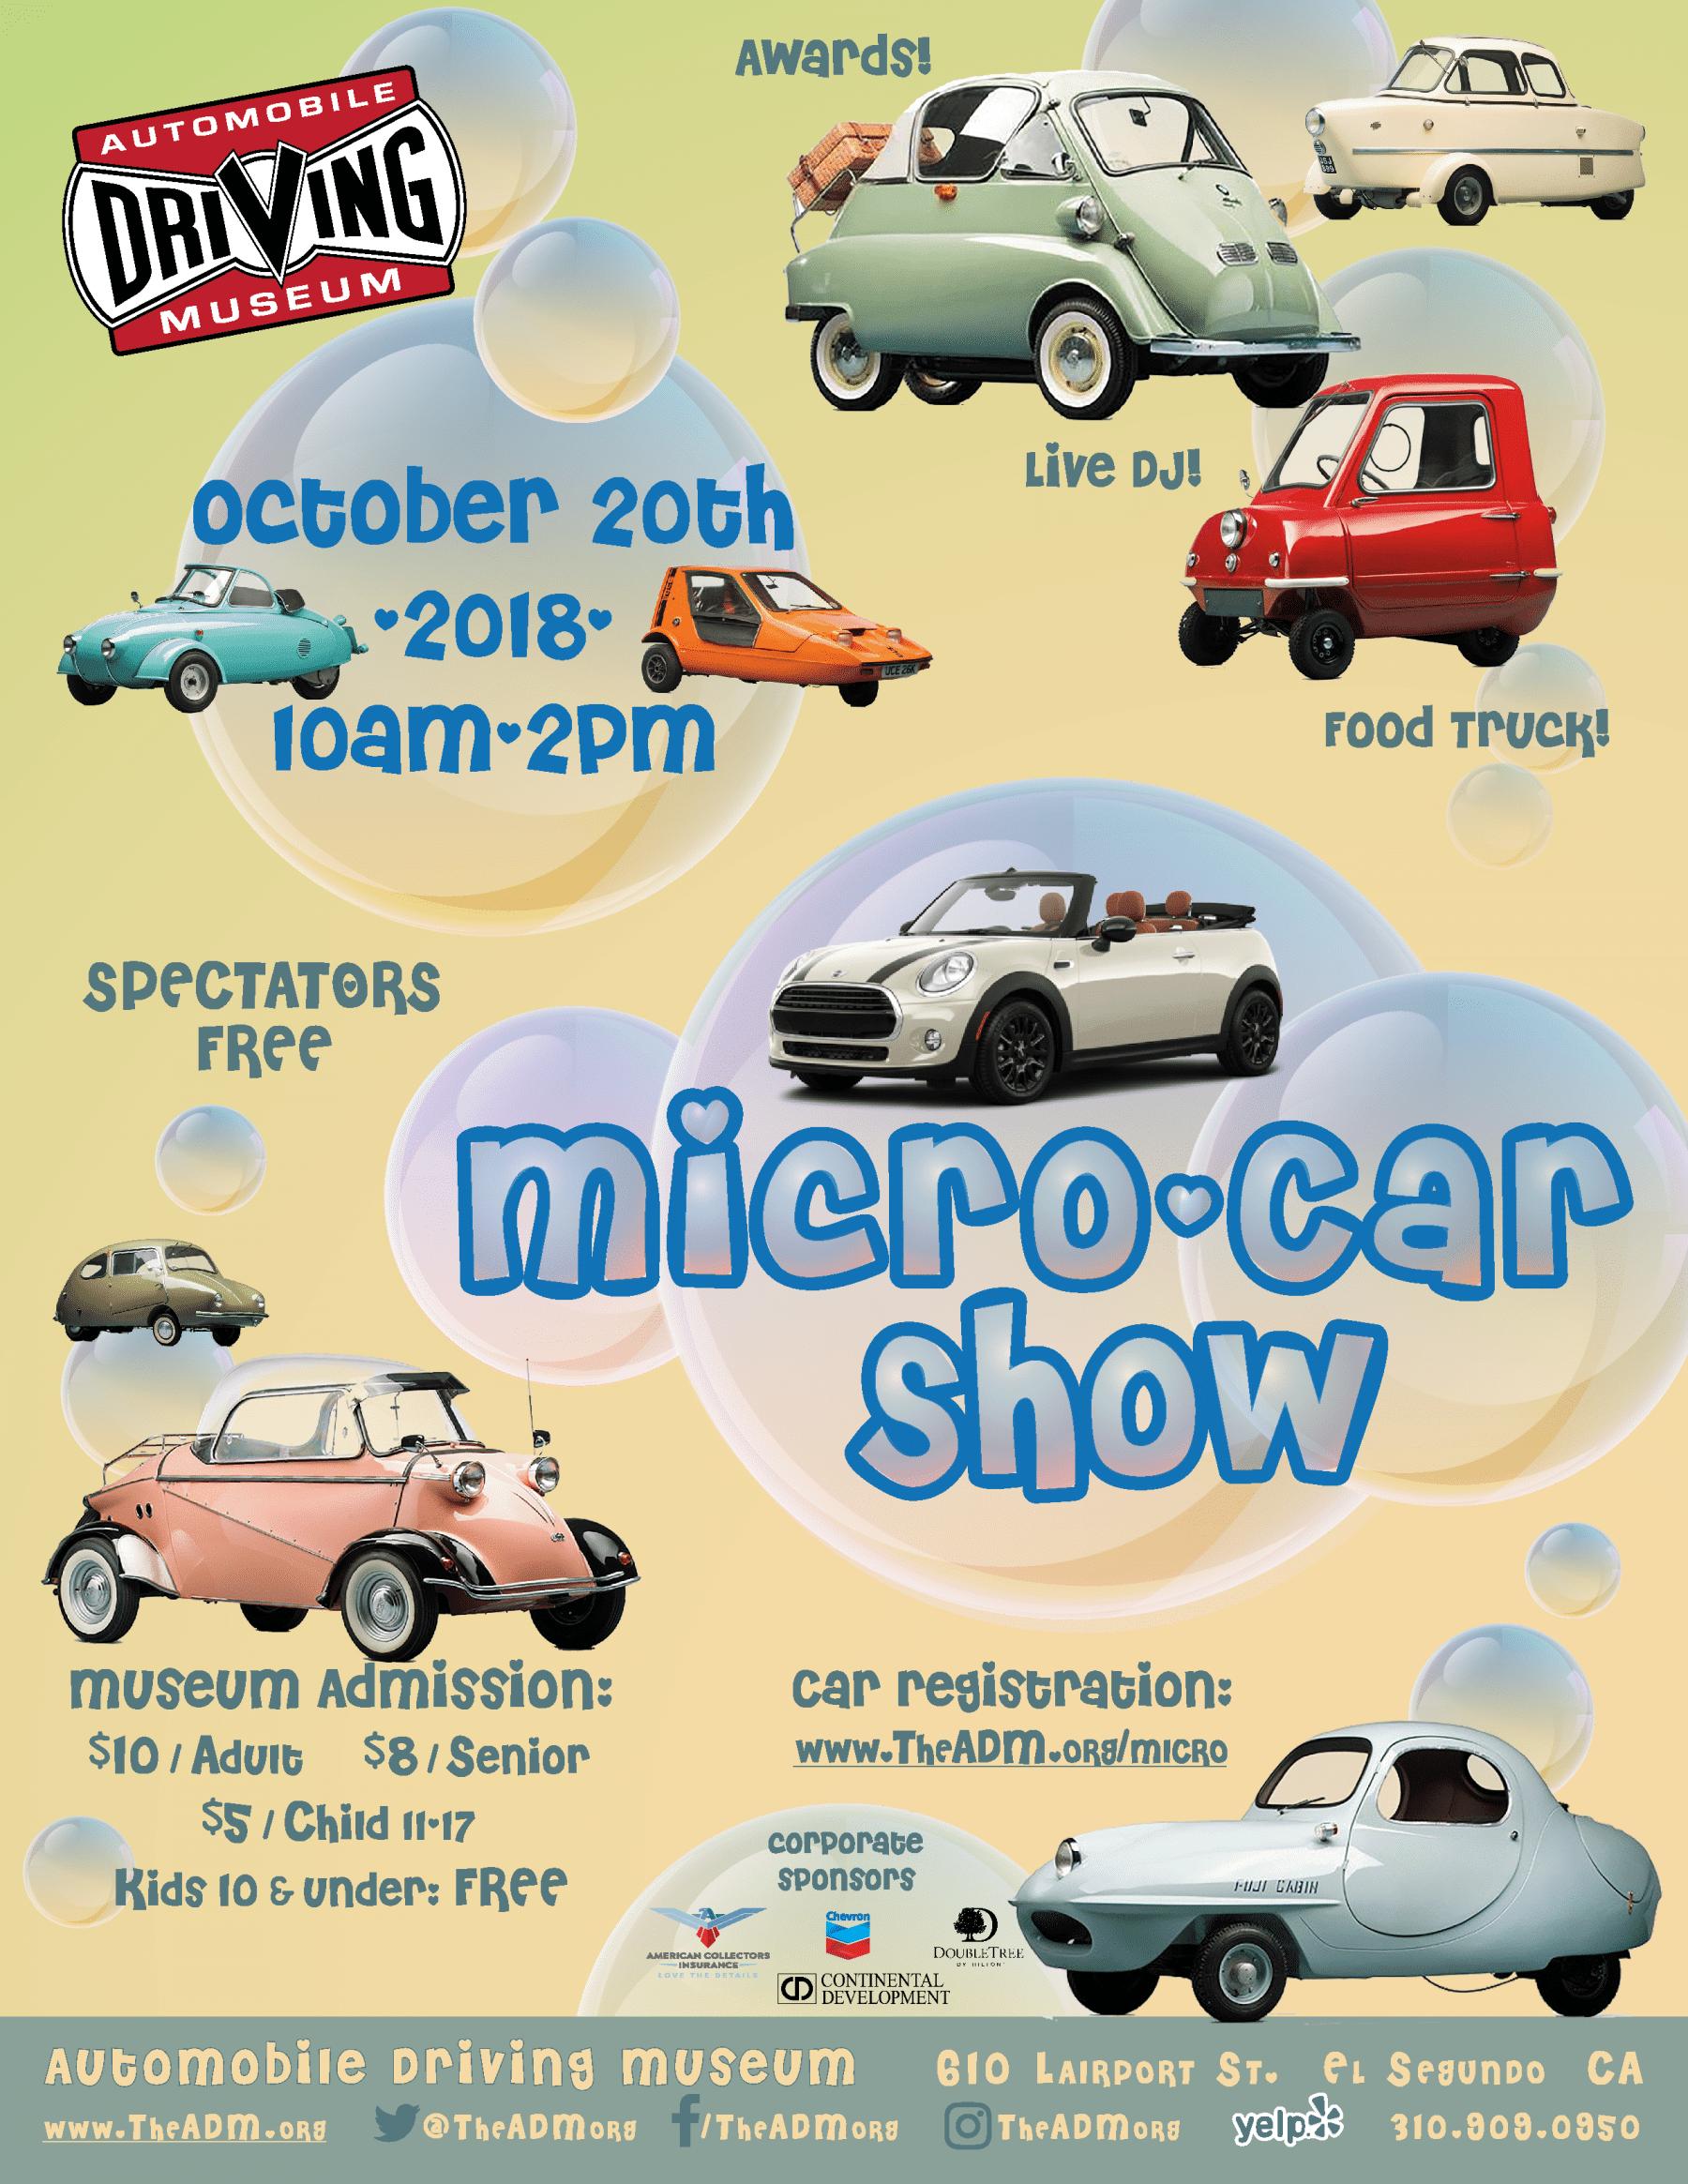 Micro And Mini Car Show Automobile Driving Museum - El segundo car show